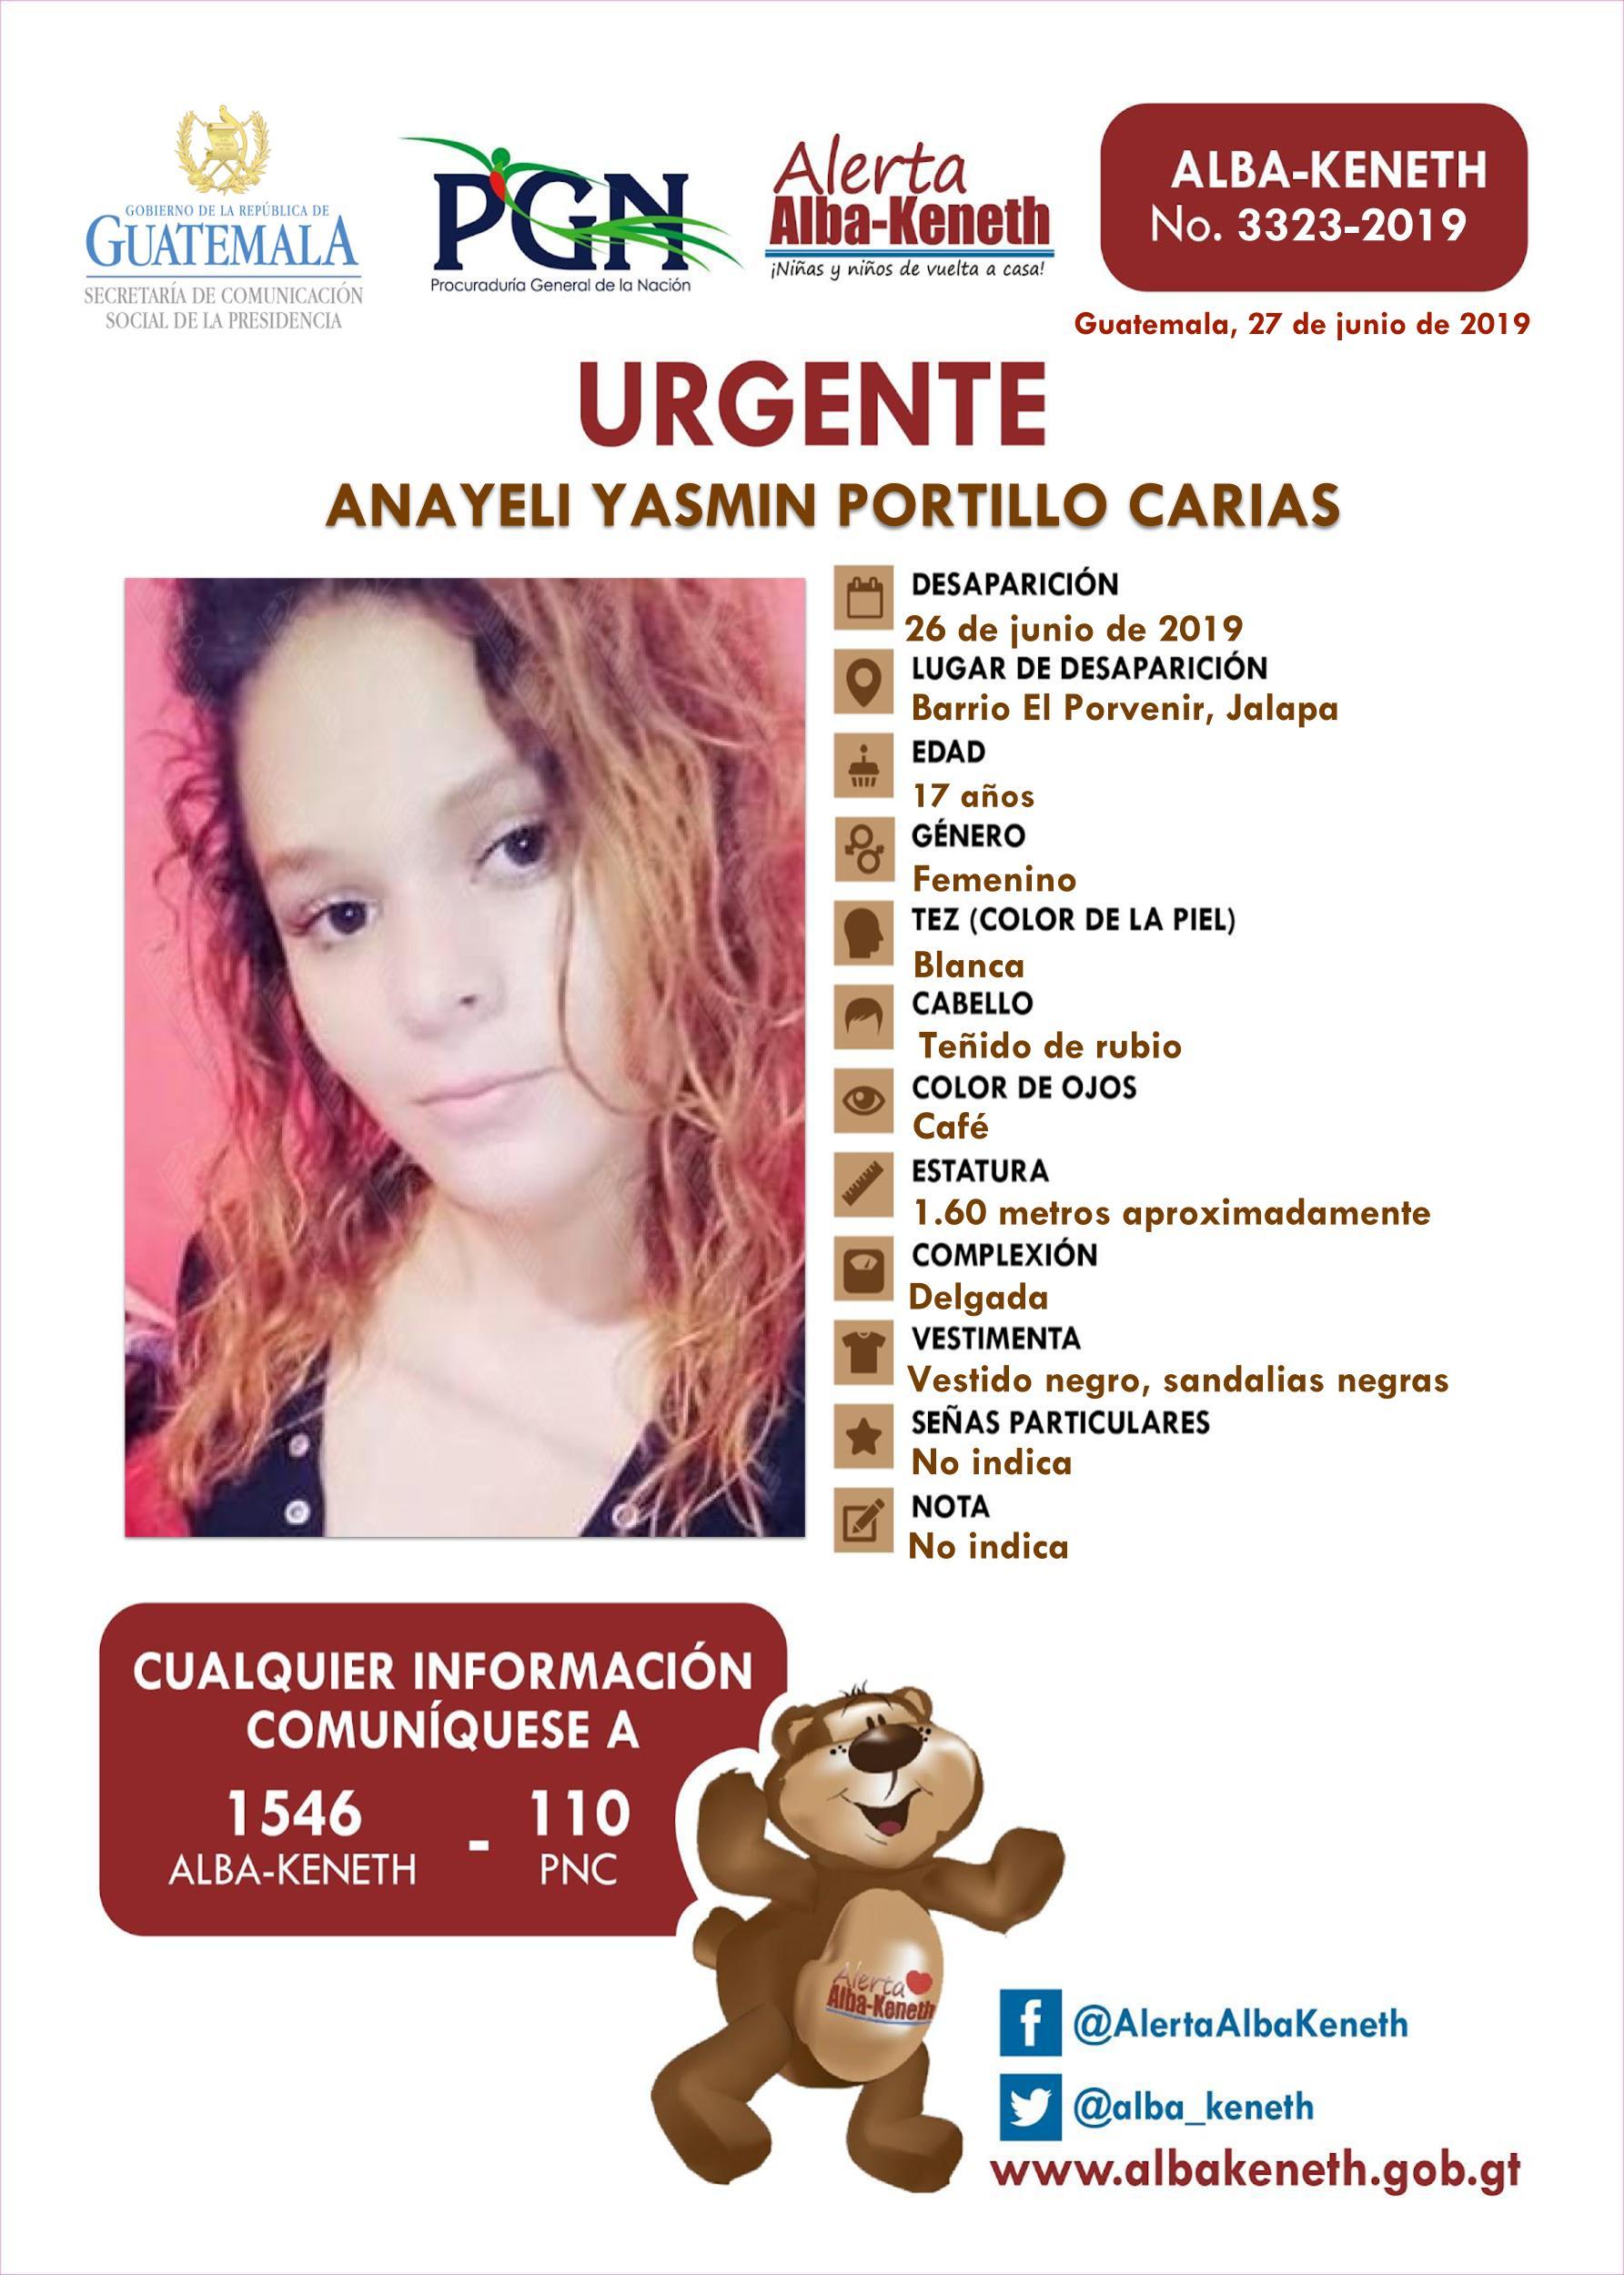 Anayeli Yasmin Portillo Carias